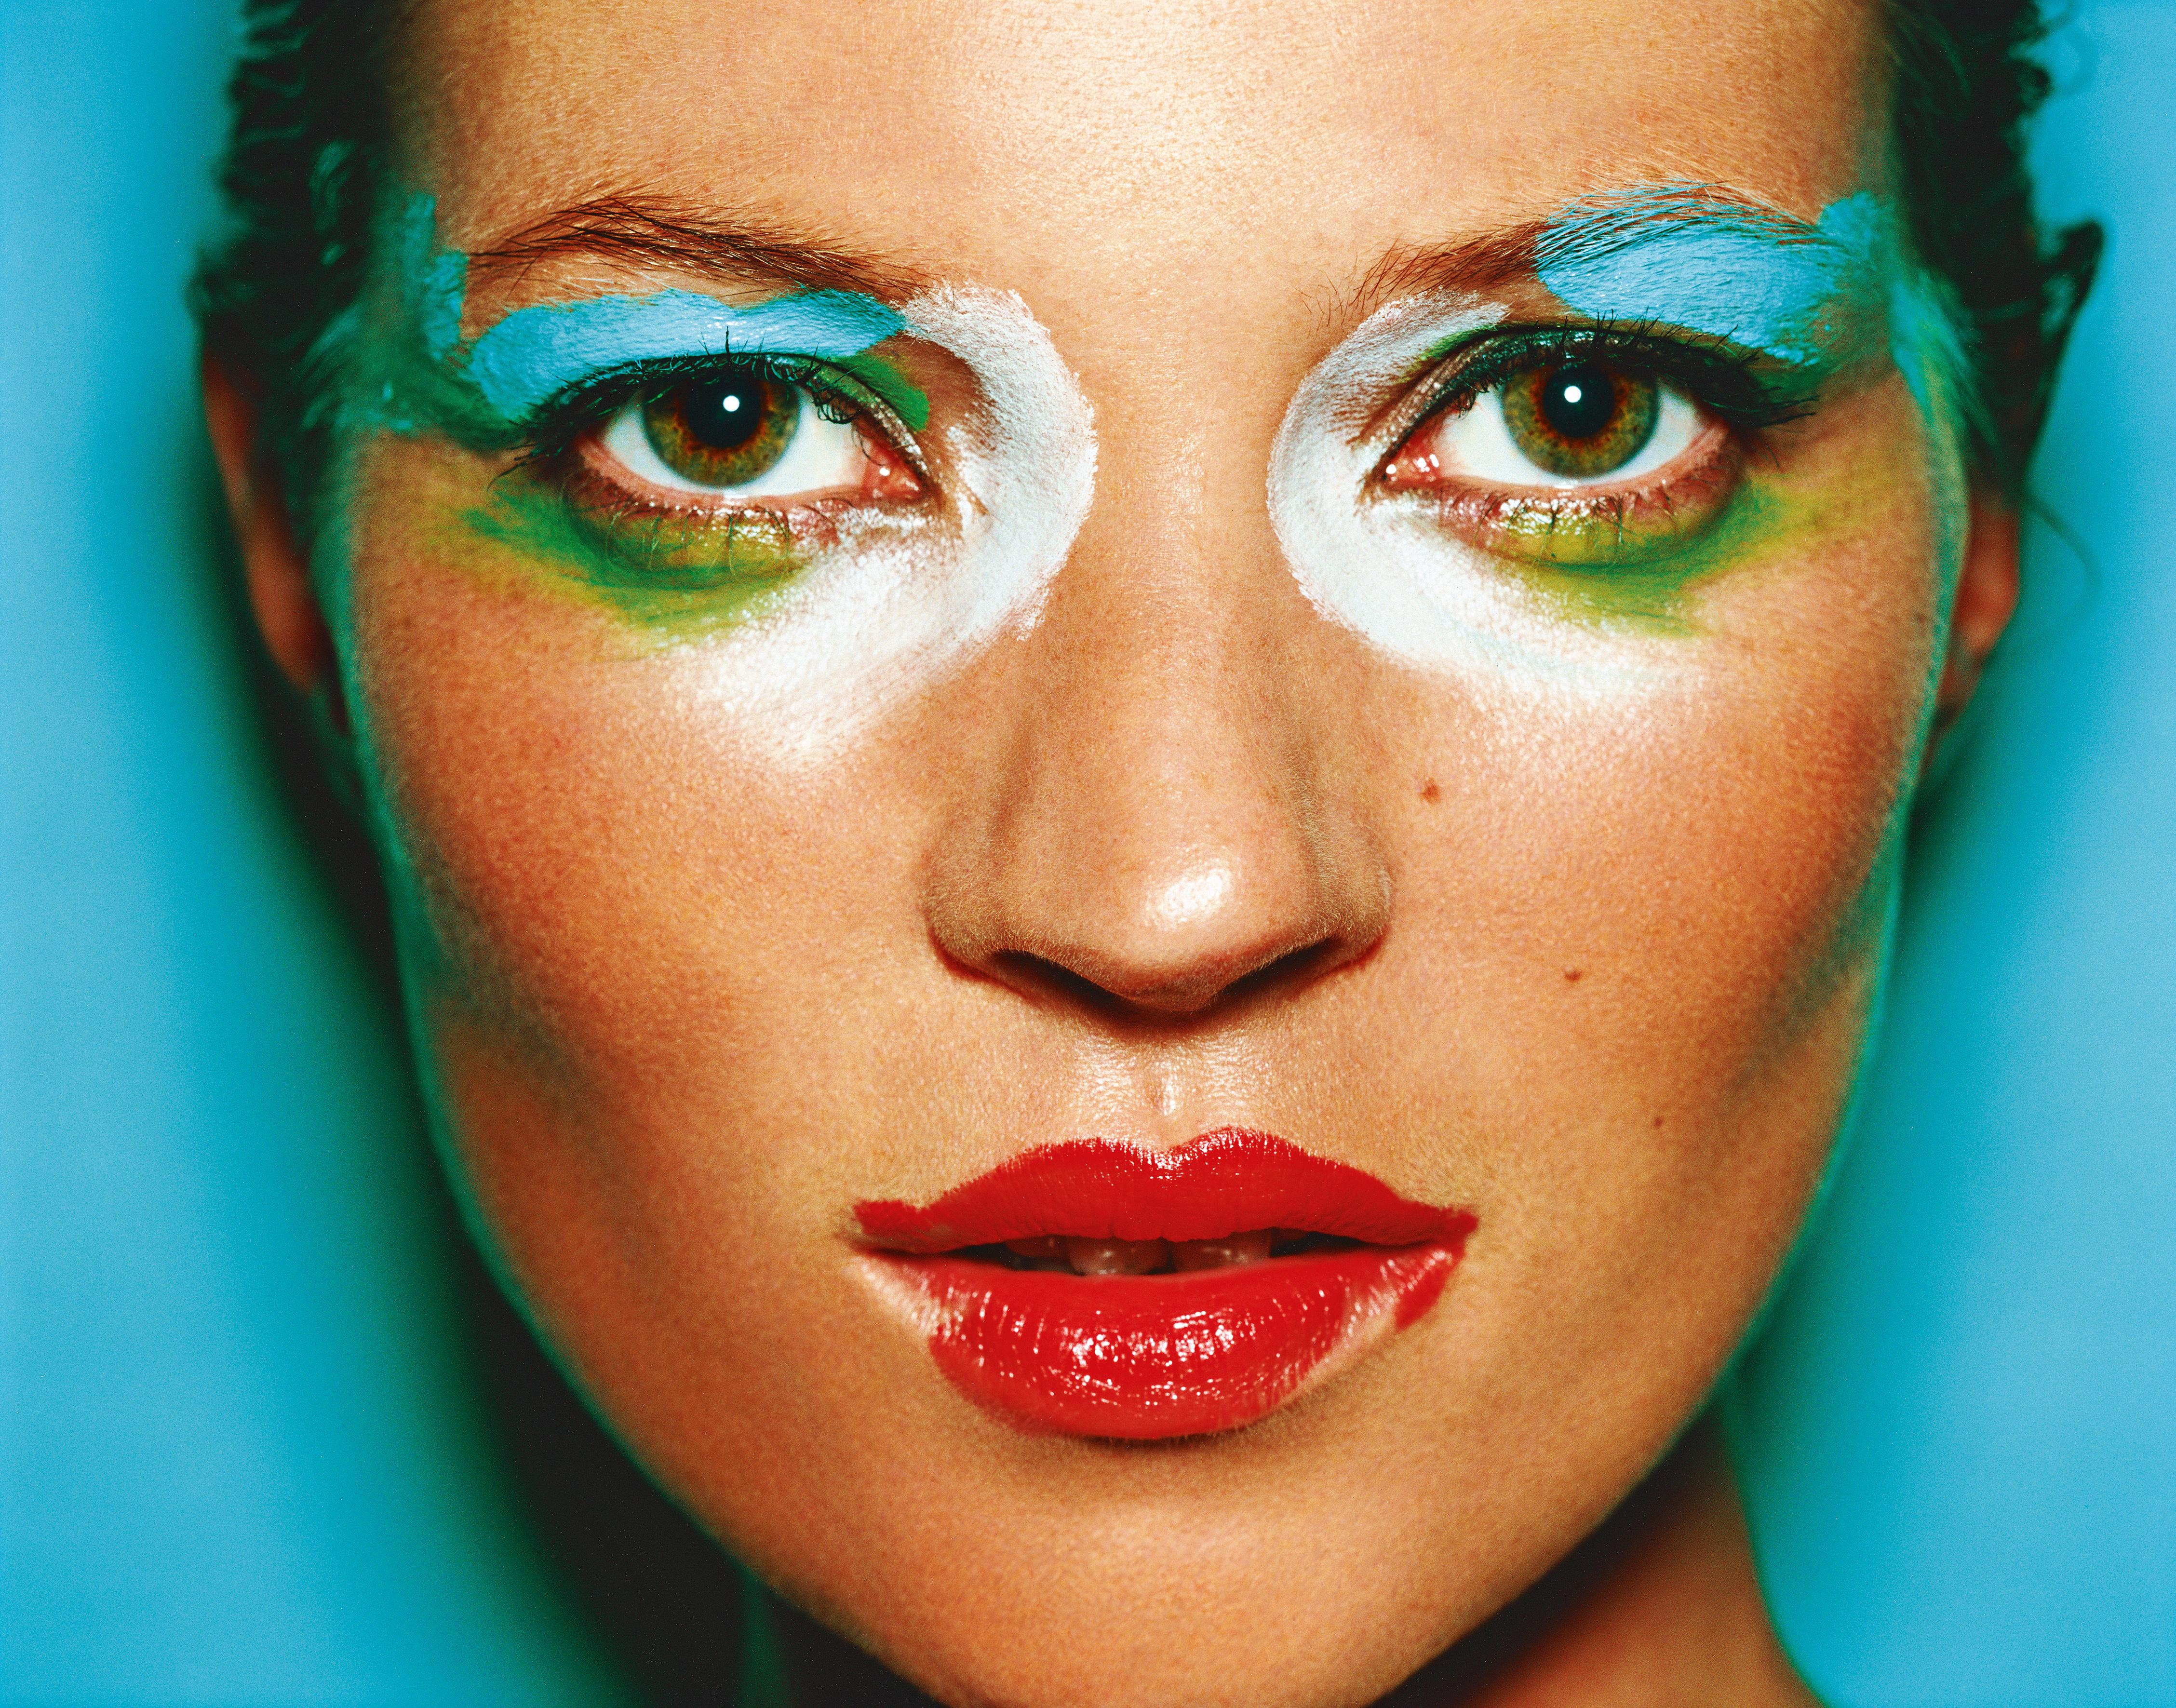 6-Kate-Moss-London-2002-c-Mario-Testino